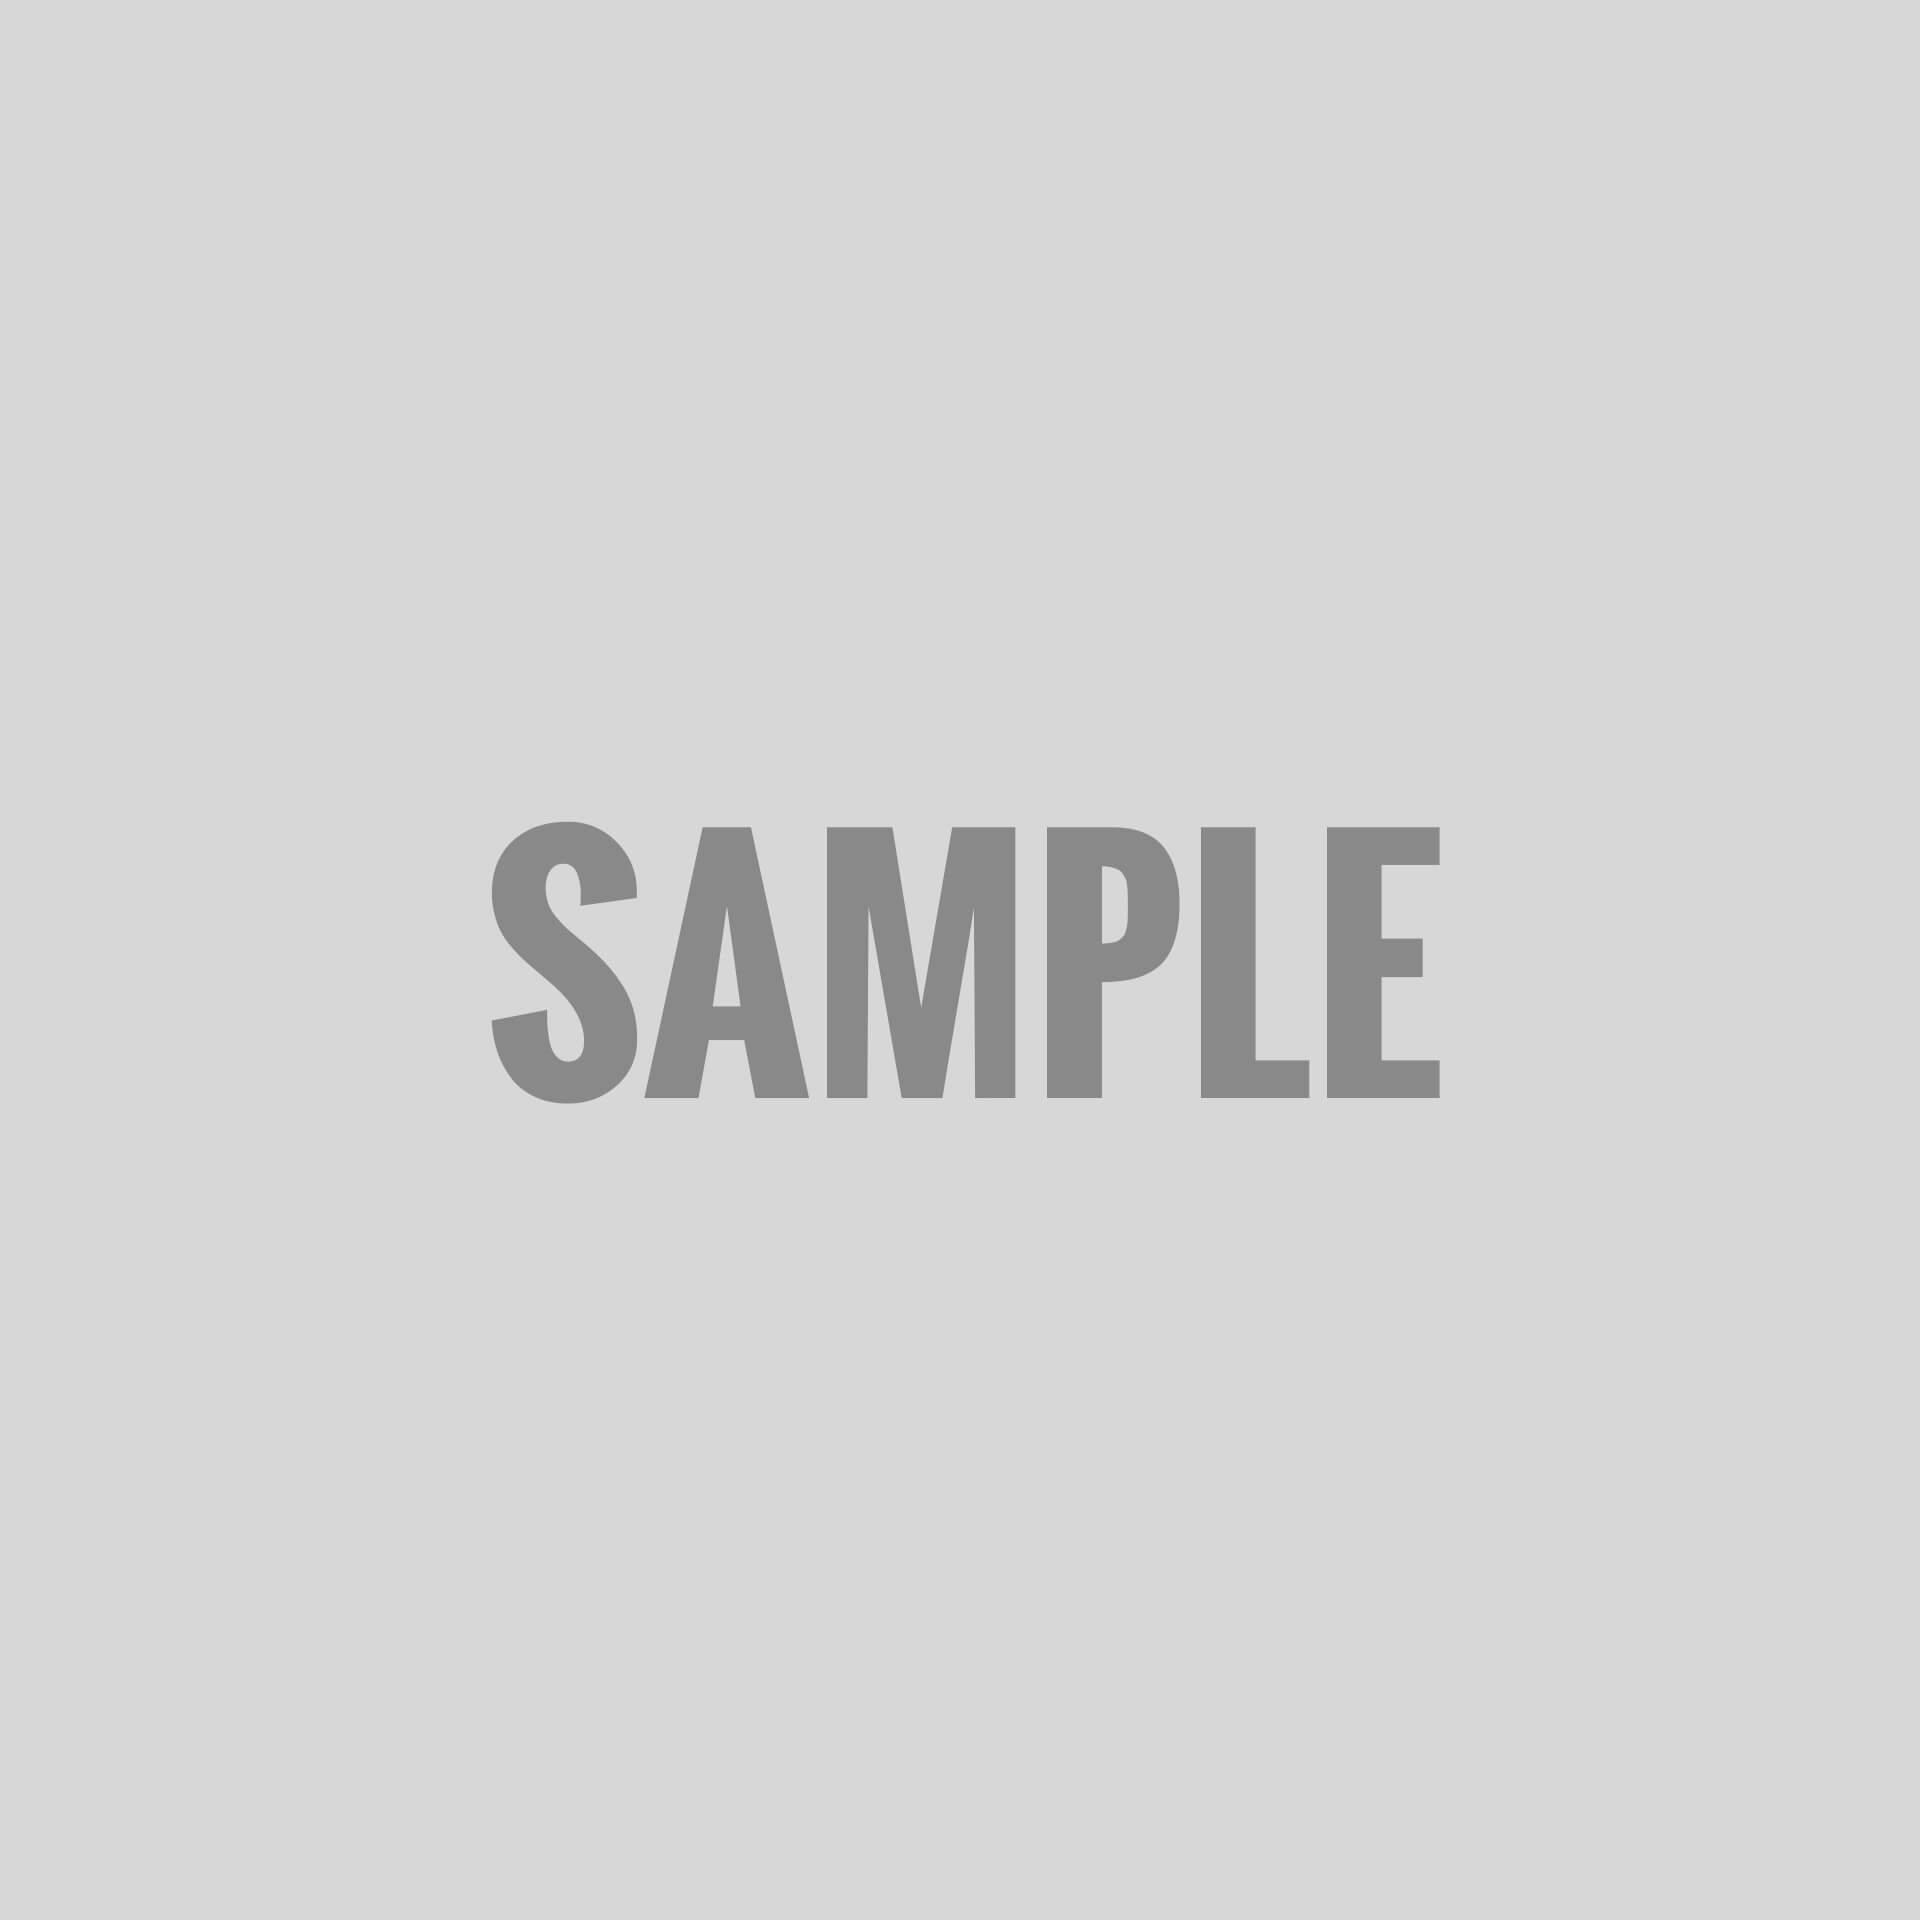 sample_2-1920x1920